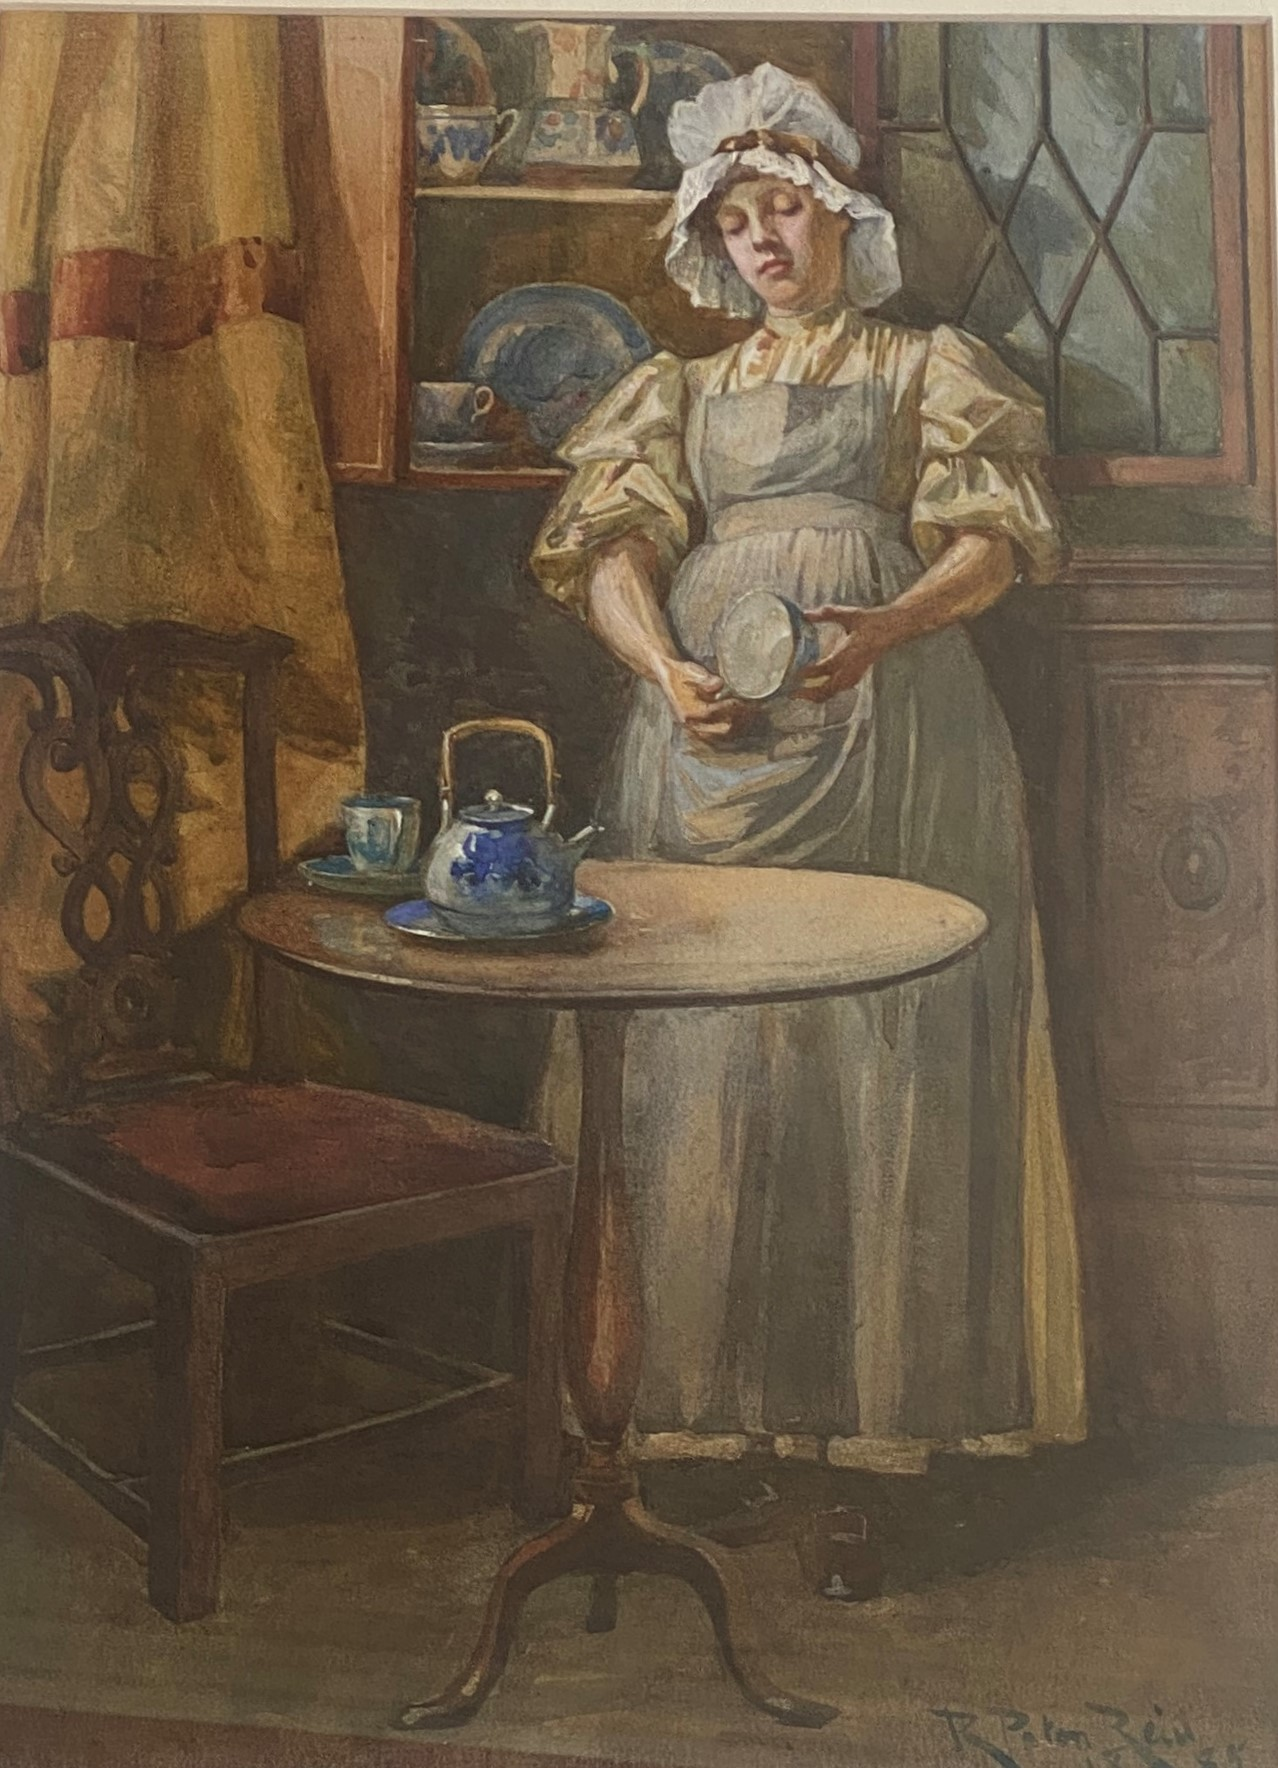 Original Signed Watercolour. Robert Paton Reid (1859 - 1945) - The Kitchen Maid